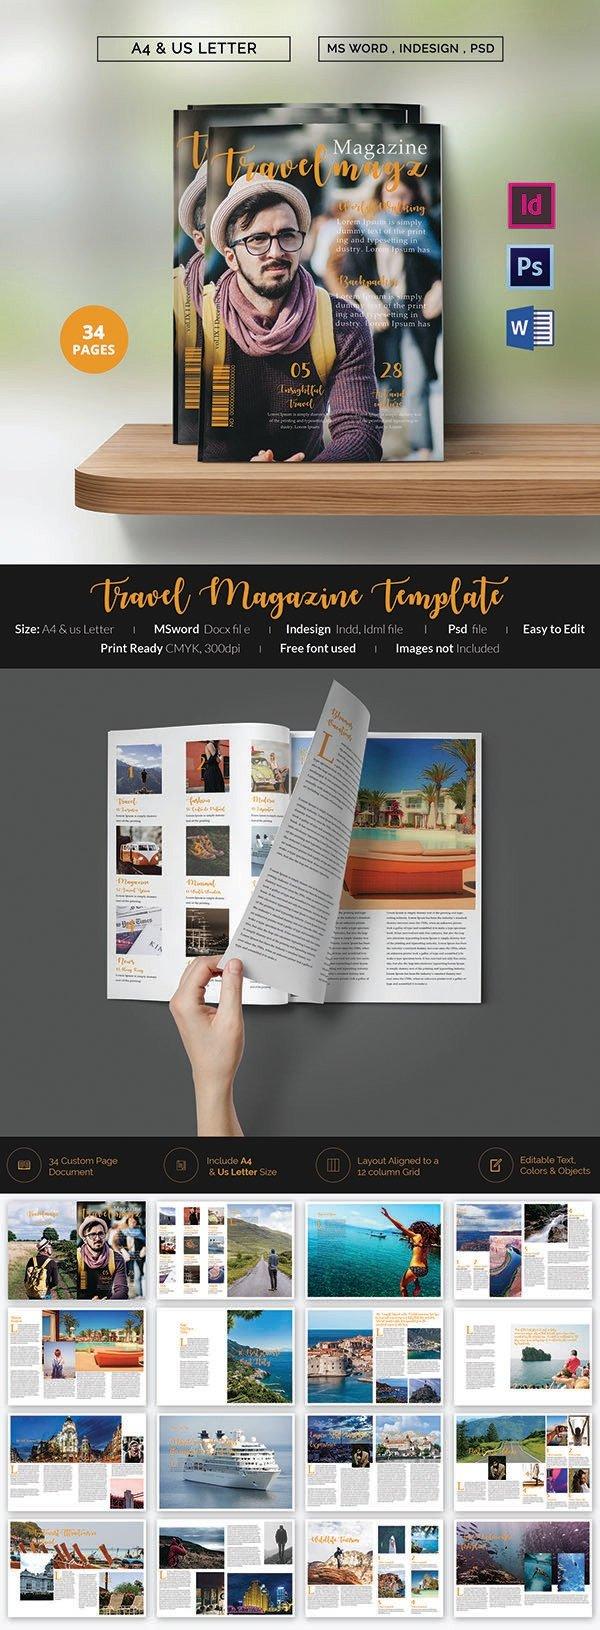 Magazine Template for Microsoft Word 55 Brand New Magazine Templates Free Word Psd Eps Ai